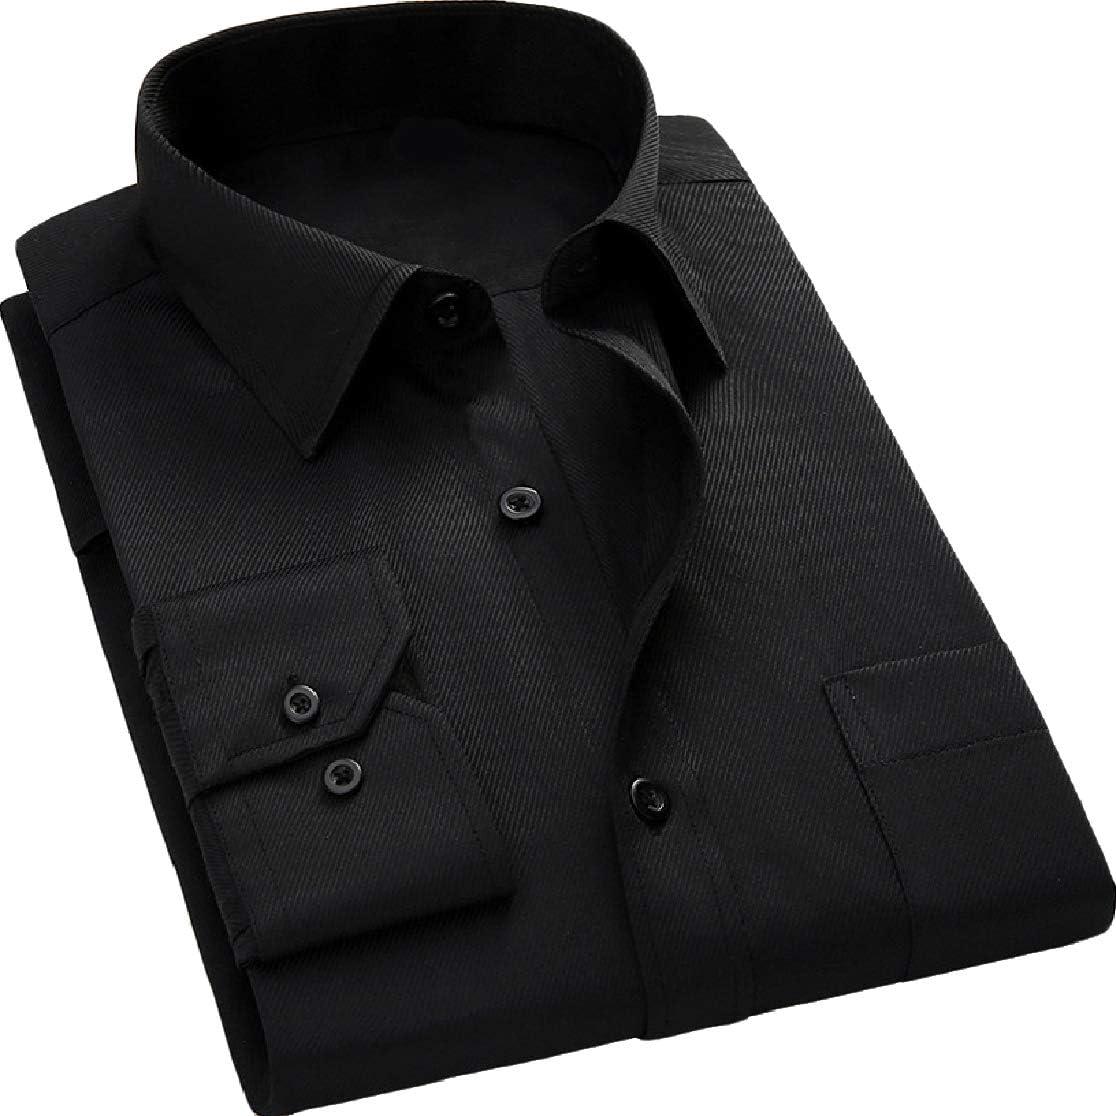 Comaba Mens Slim Lapel Long-Sleeve Button Pocket Oversized T-Shirts Shirt